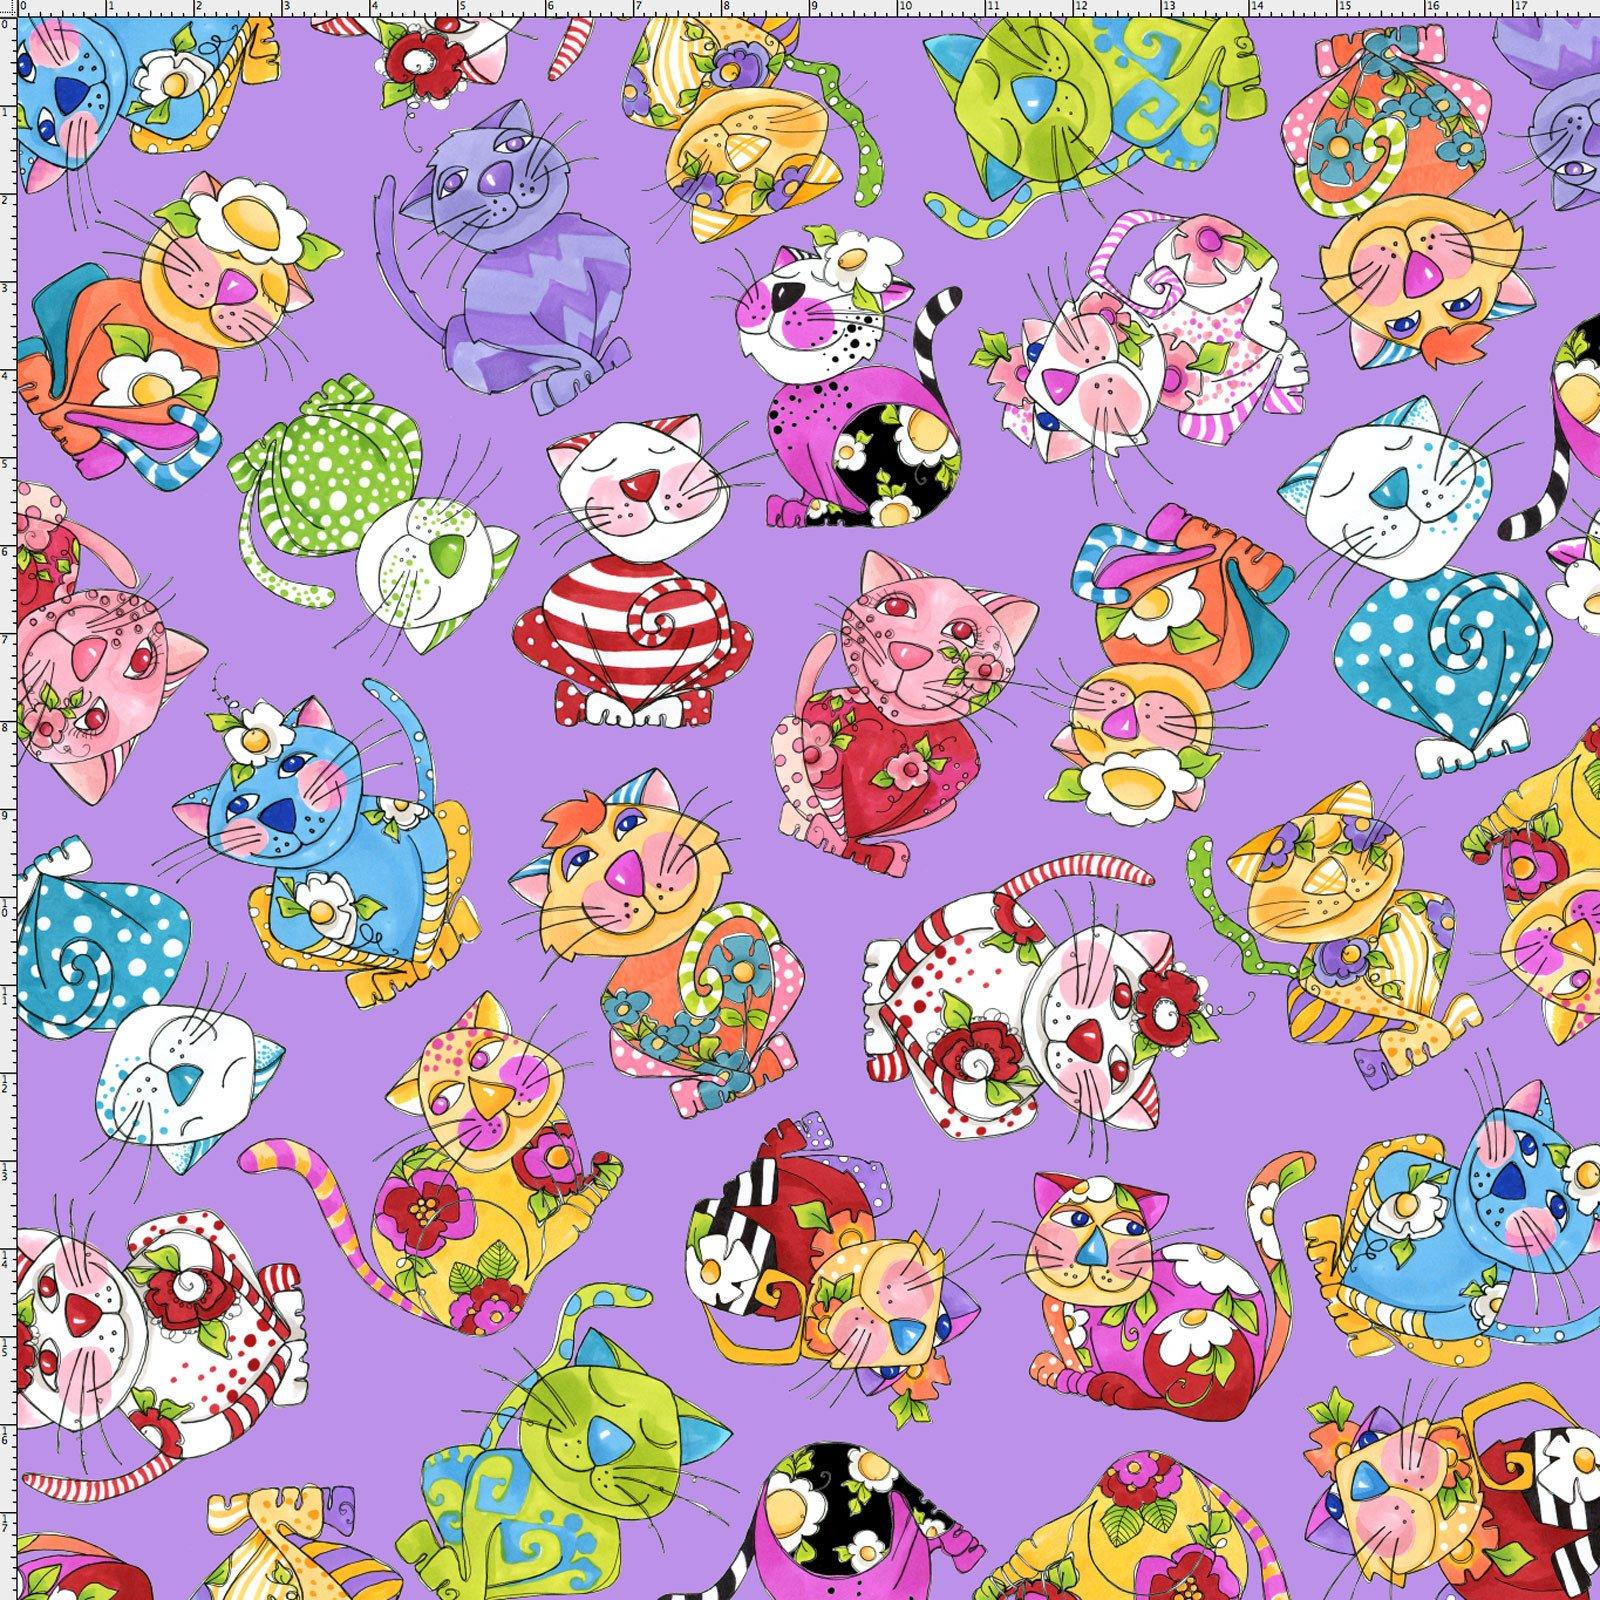 【Loralie Designs】- Calico Toss Purple Fabric -(ULH-152)